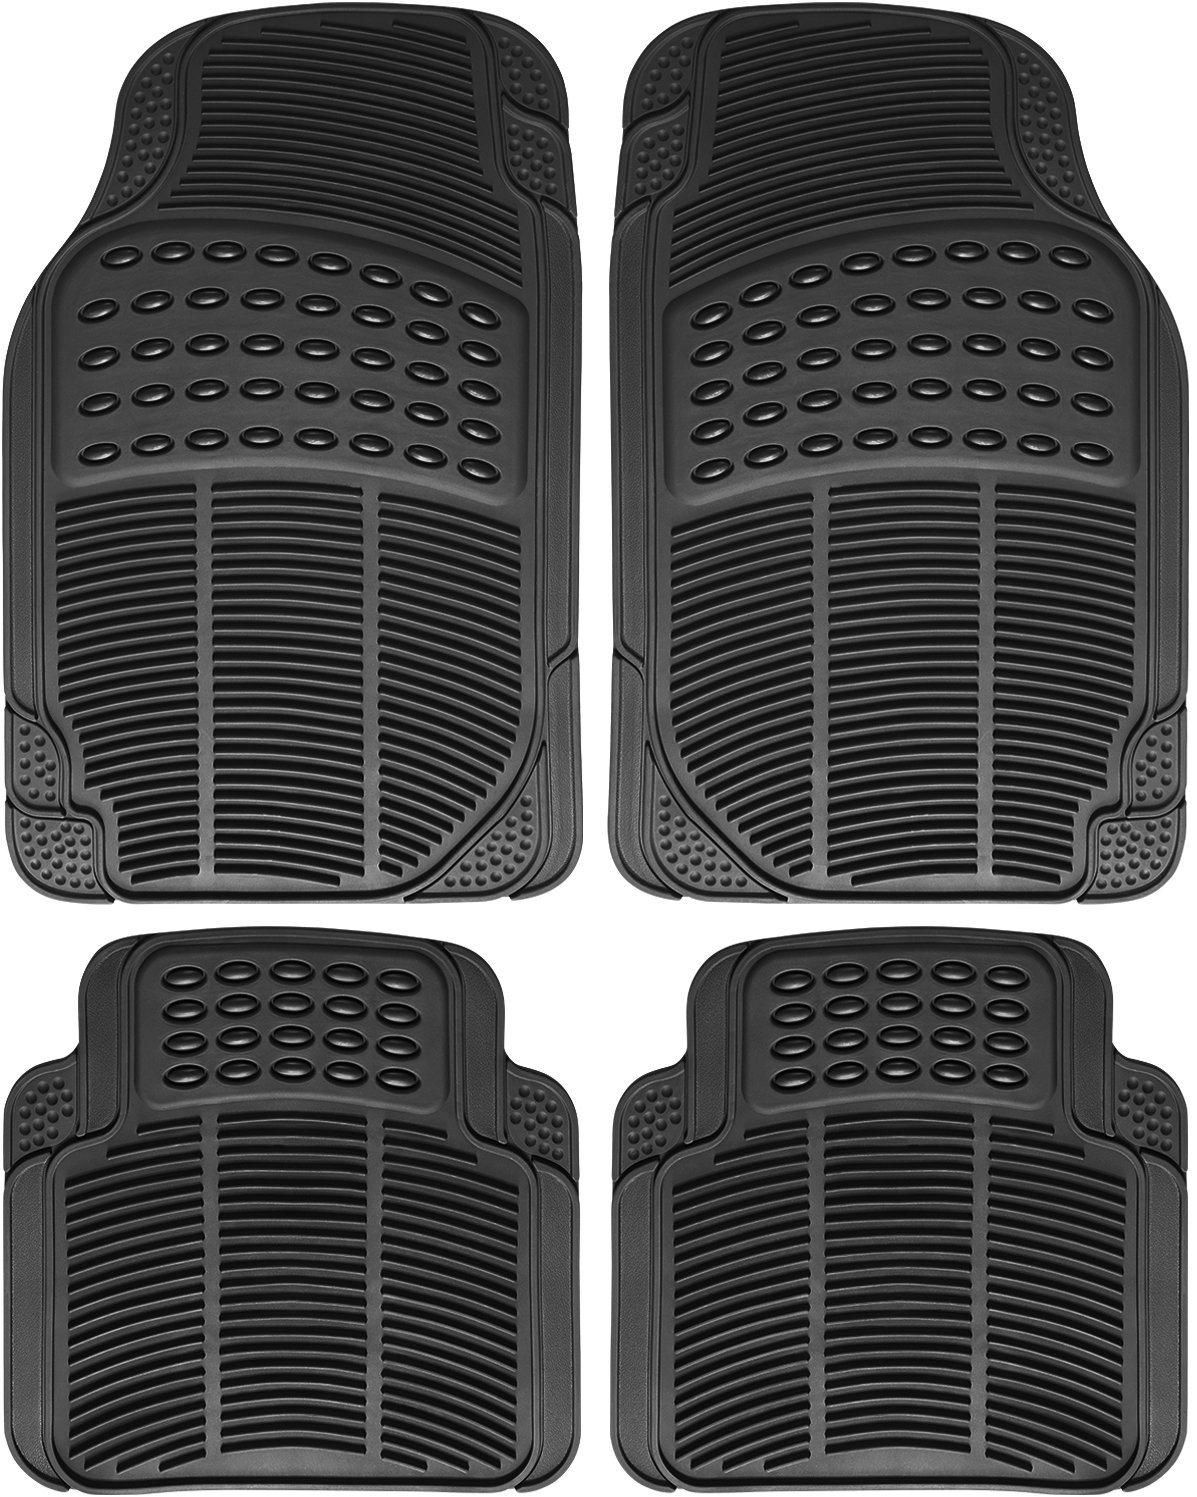 Rubber Auto Floor Mats Choice Image Home Fixtures